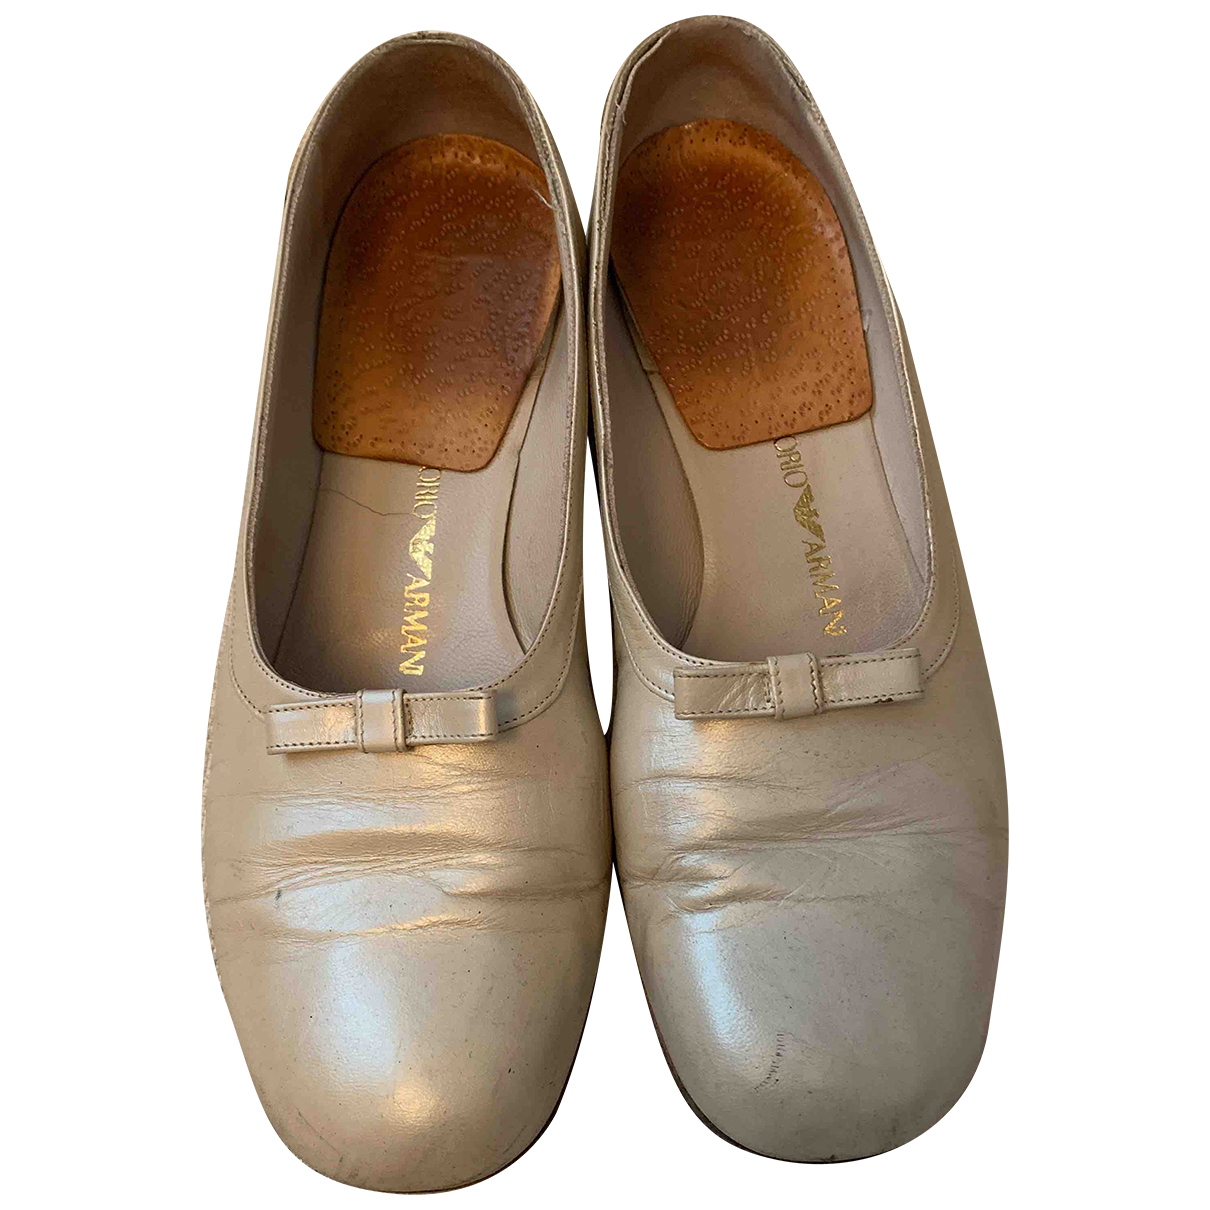 Emporio Armani N Beige Leather Sandals for Women 38 EU